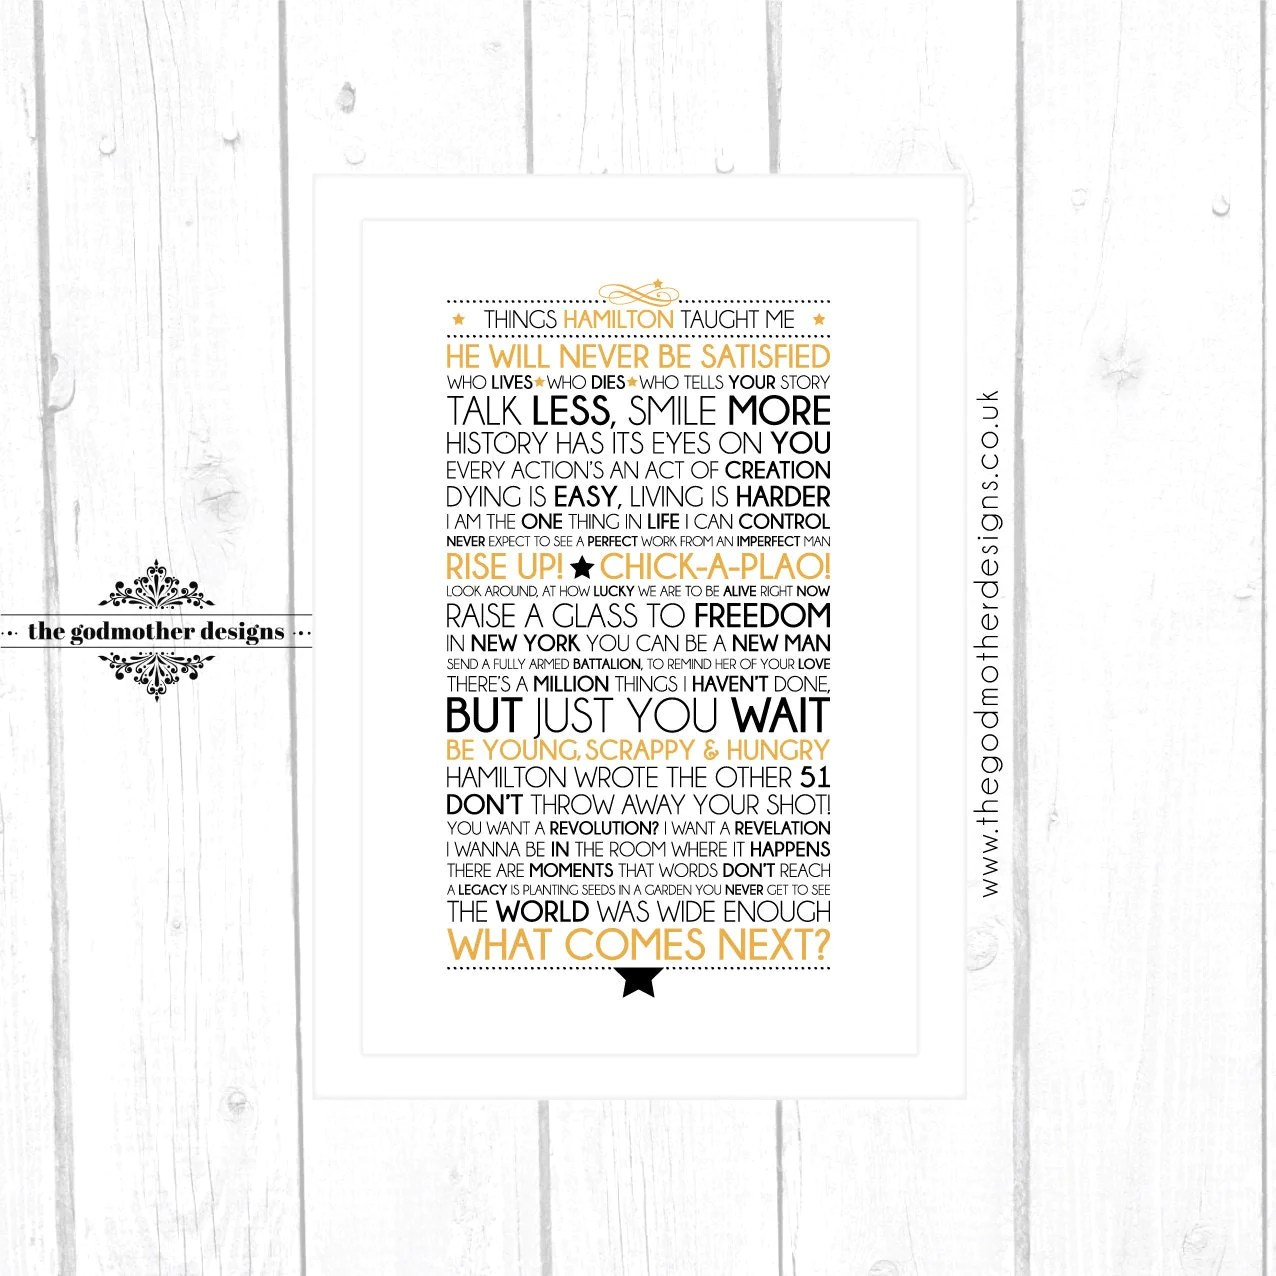 Dear Evan Hansen Quotes Wallpaper Hamilton Broadway Musical Quotes Lyrics Typographic Print